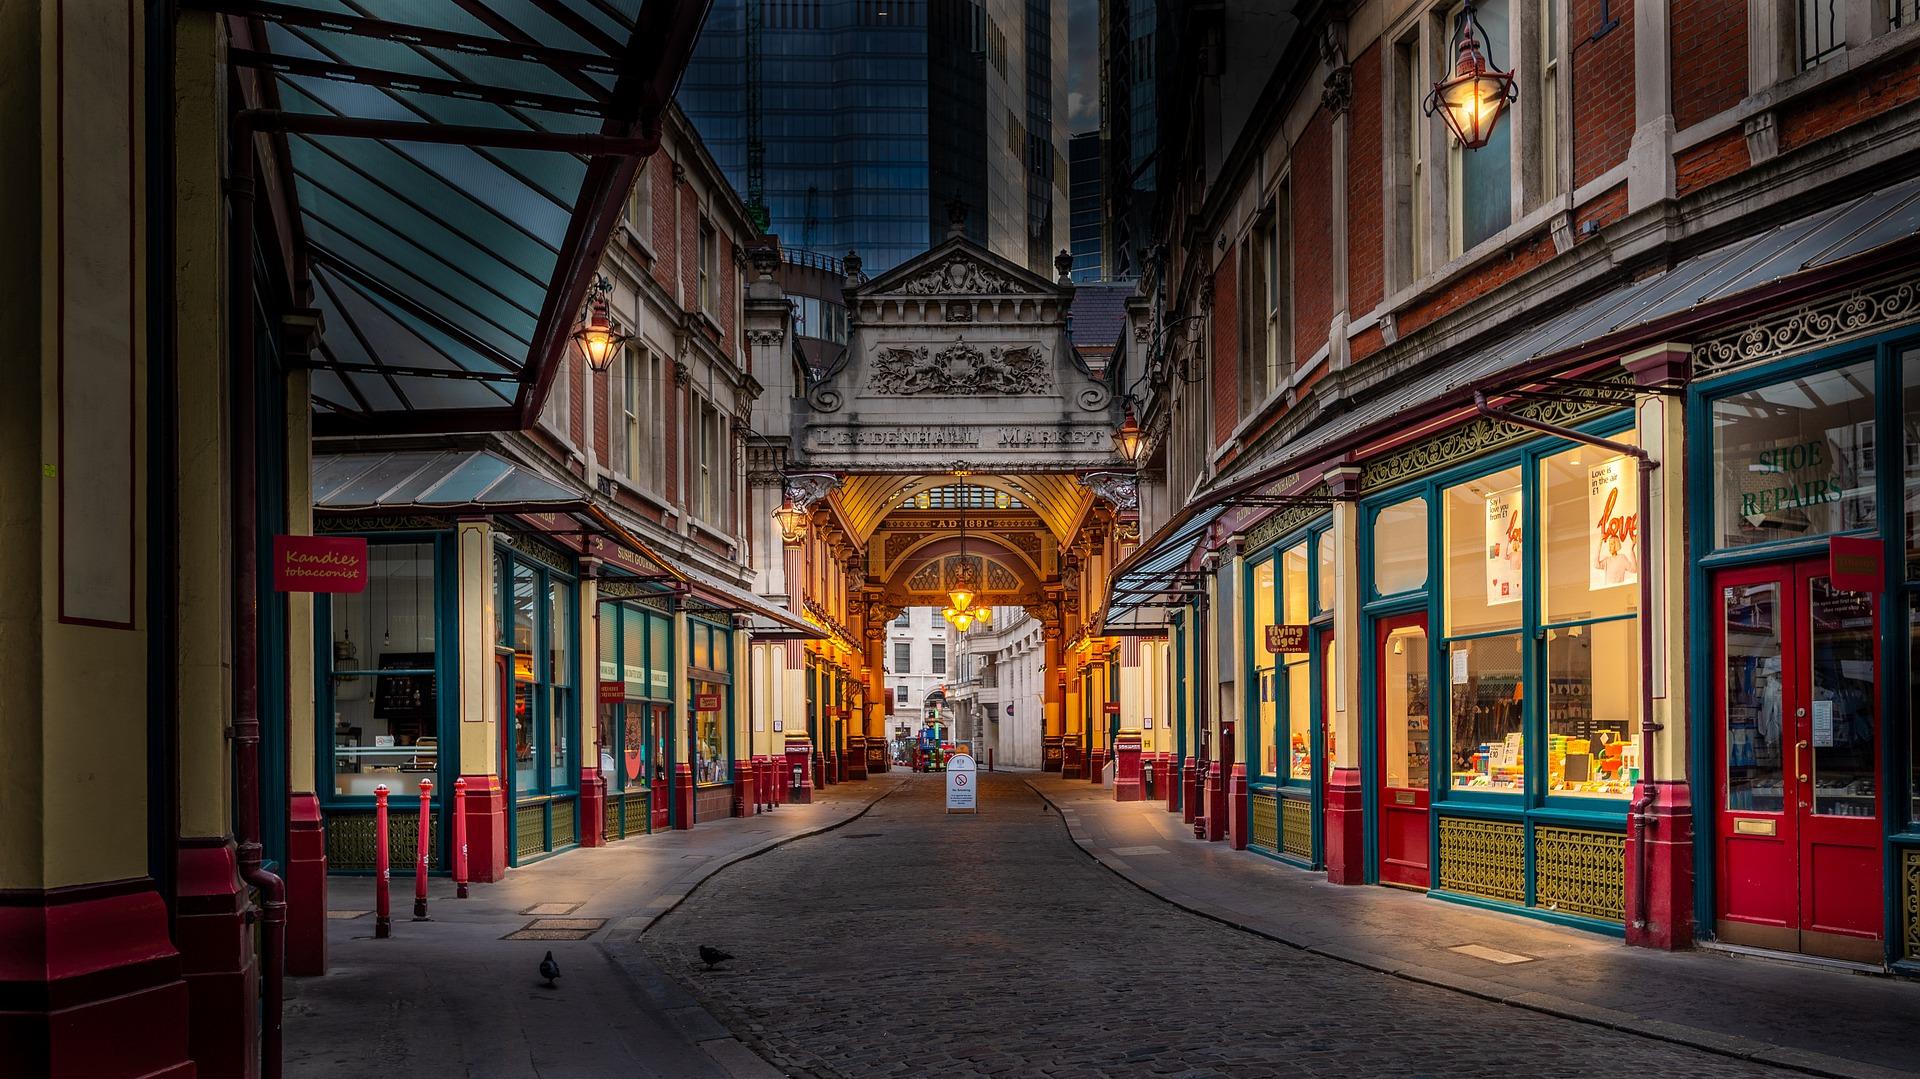 The markets of London await!